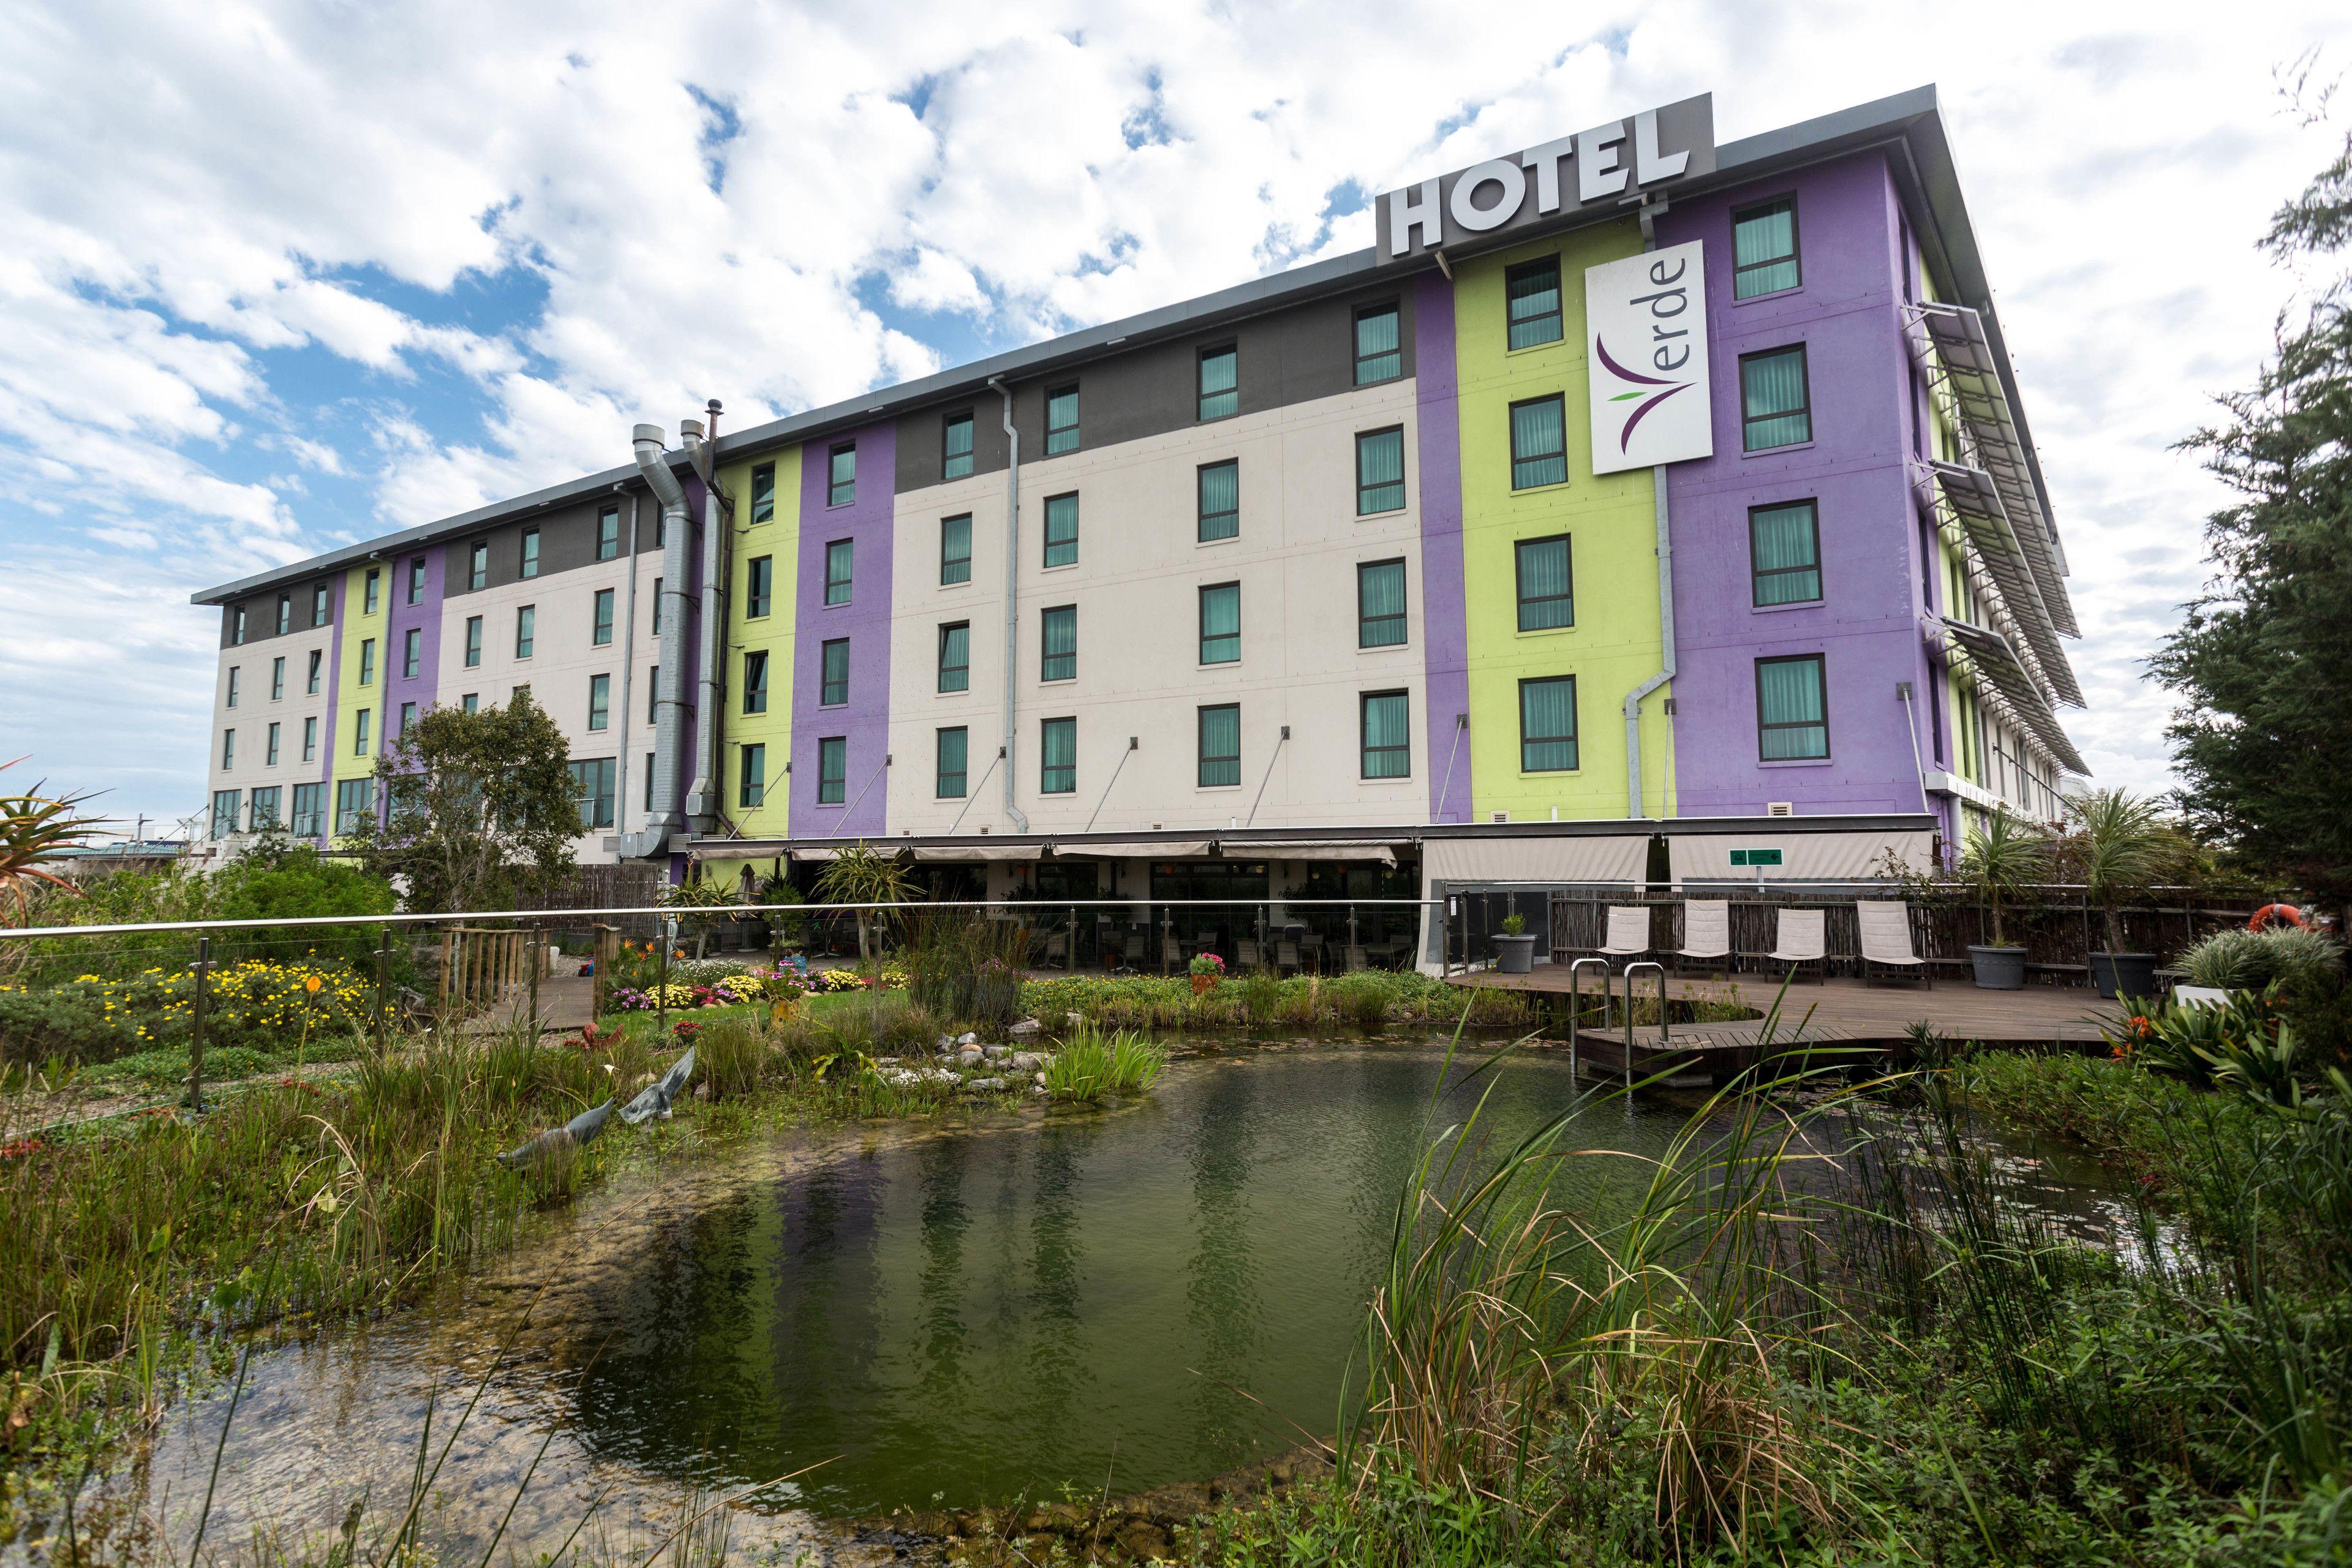 South_Africa_Hotel_Verde1.jpg?1555410824